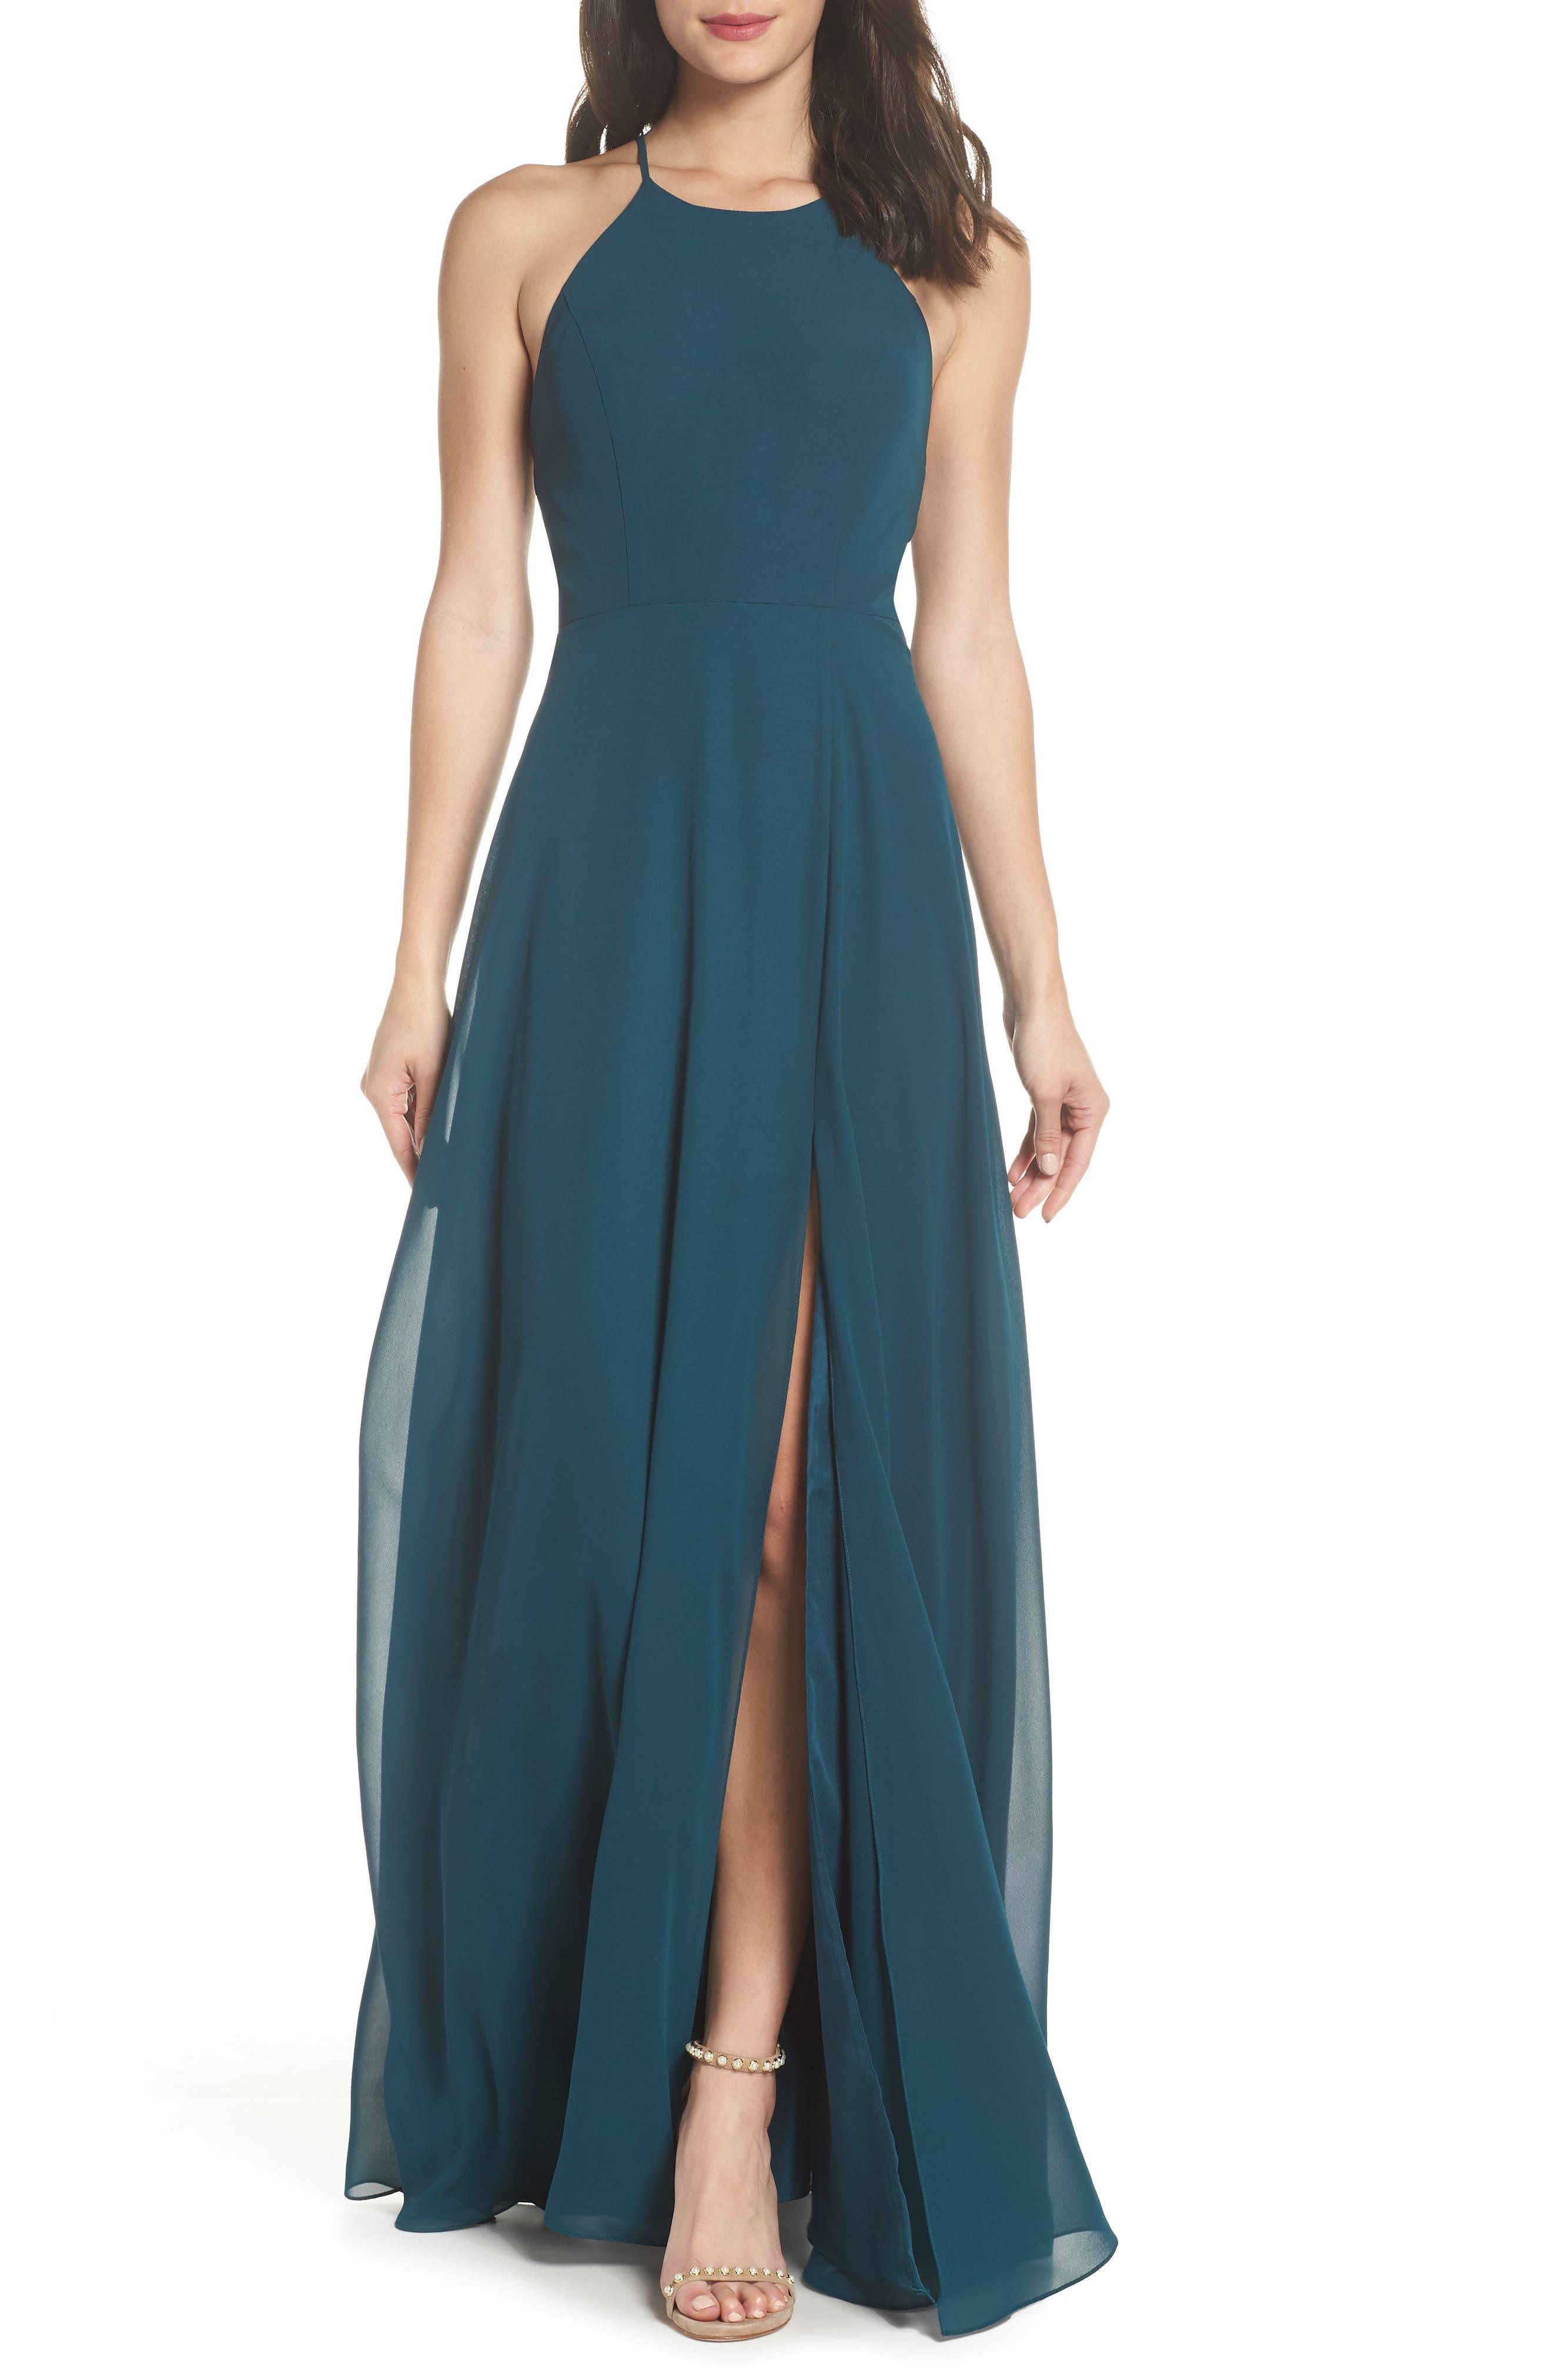 JENNY YOO, Kayla A-Line Halter Gown, Alternate thumbnail 6, color, CASPIAN SEA